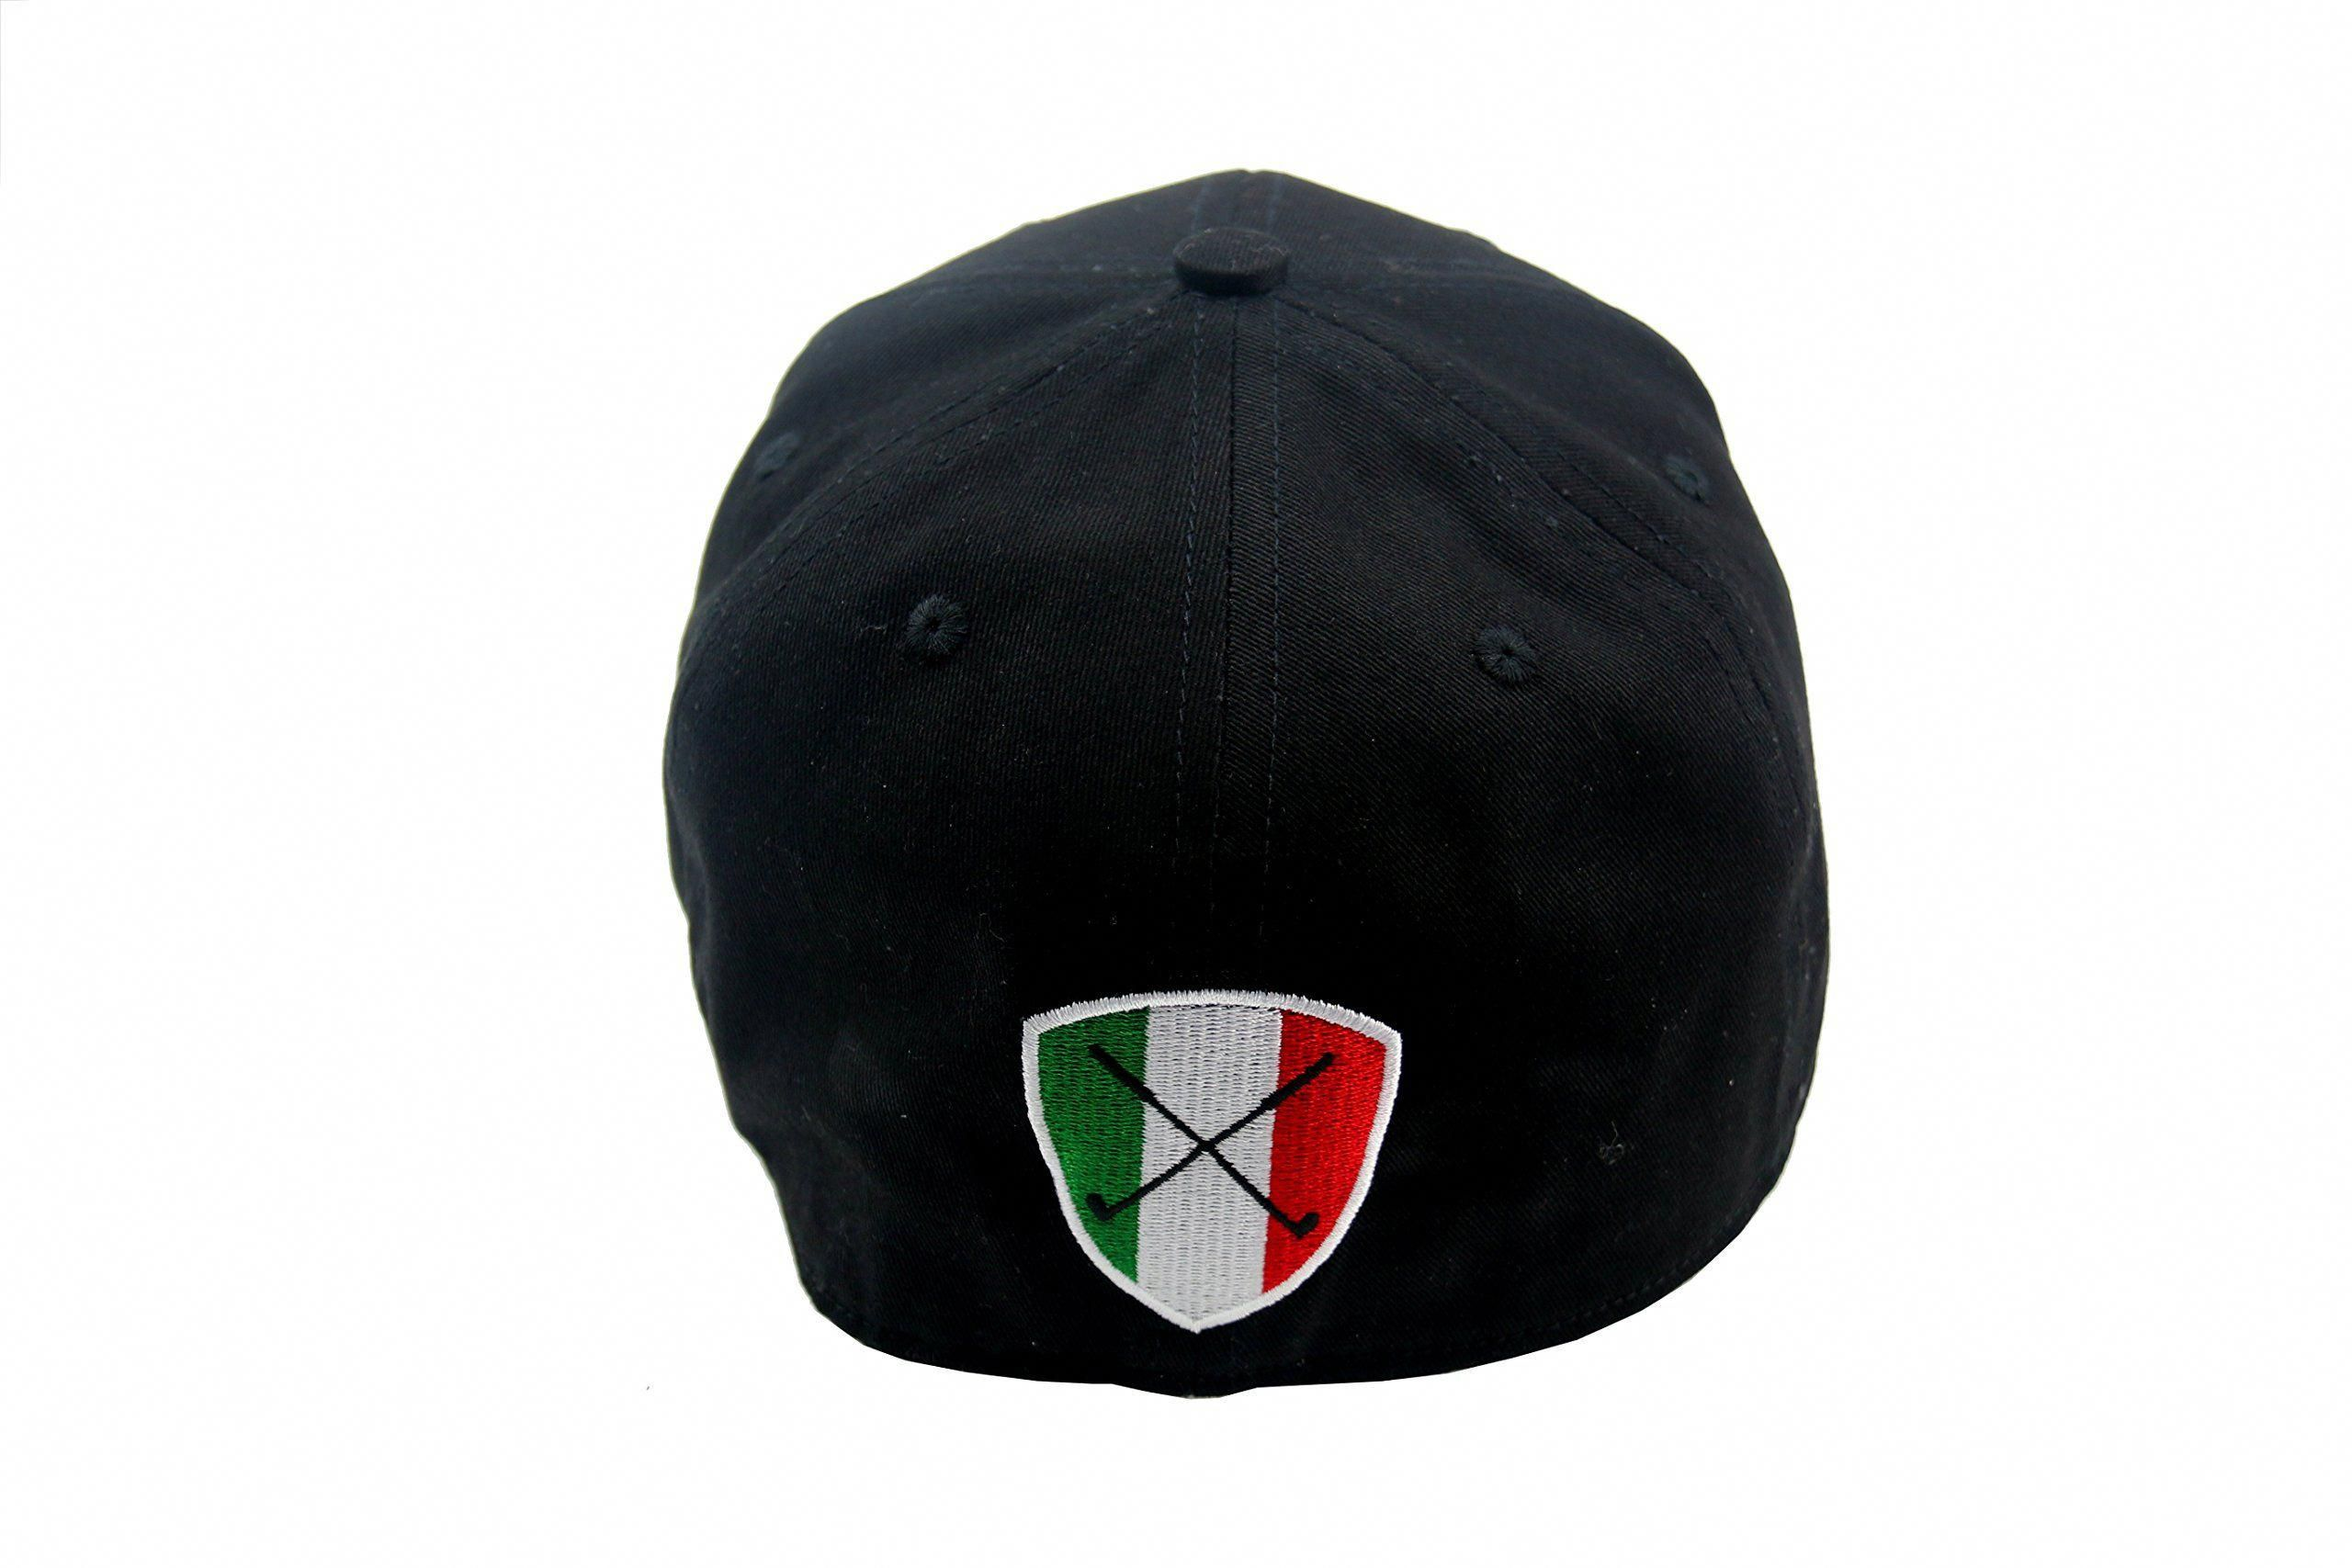 fb1d5cfc9b7 Men Golf Clothing - Tonino Lamborghini Unisex Cotton Golf Cap Black 54 cm.   mensgolfclothes